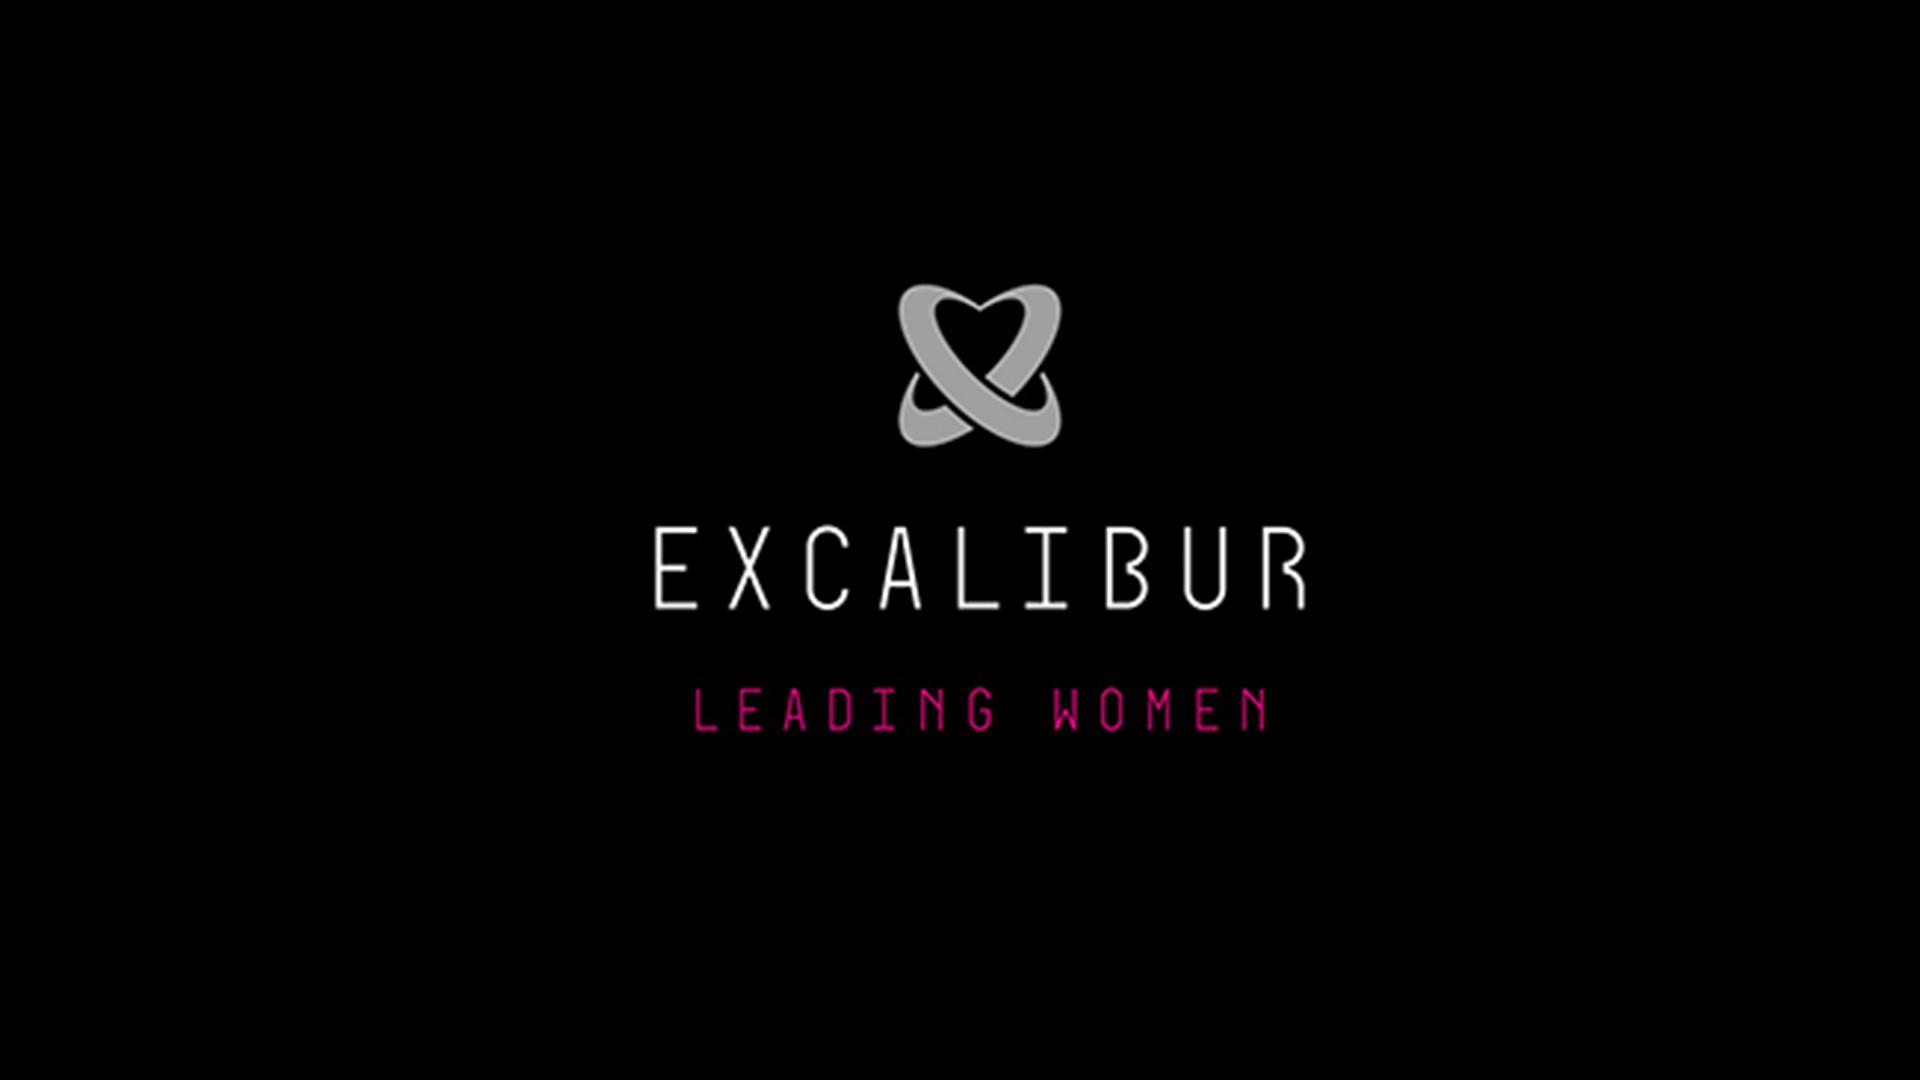 Excalibur Leading Women